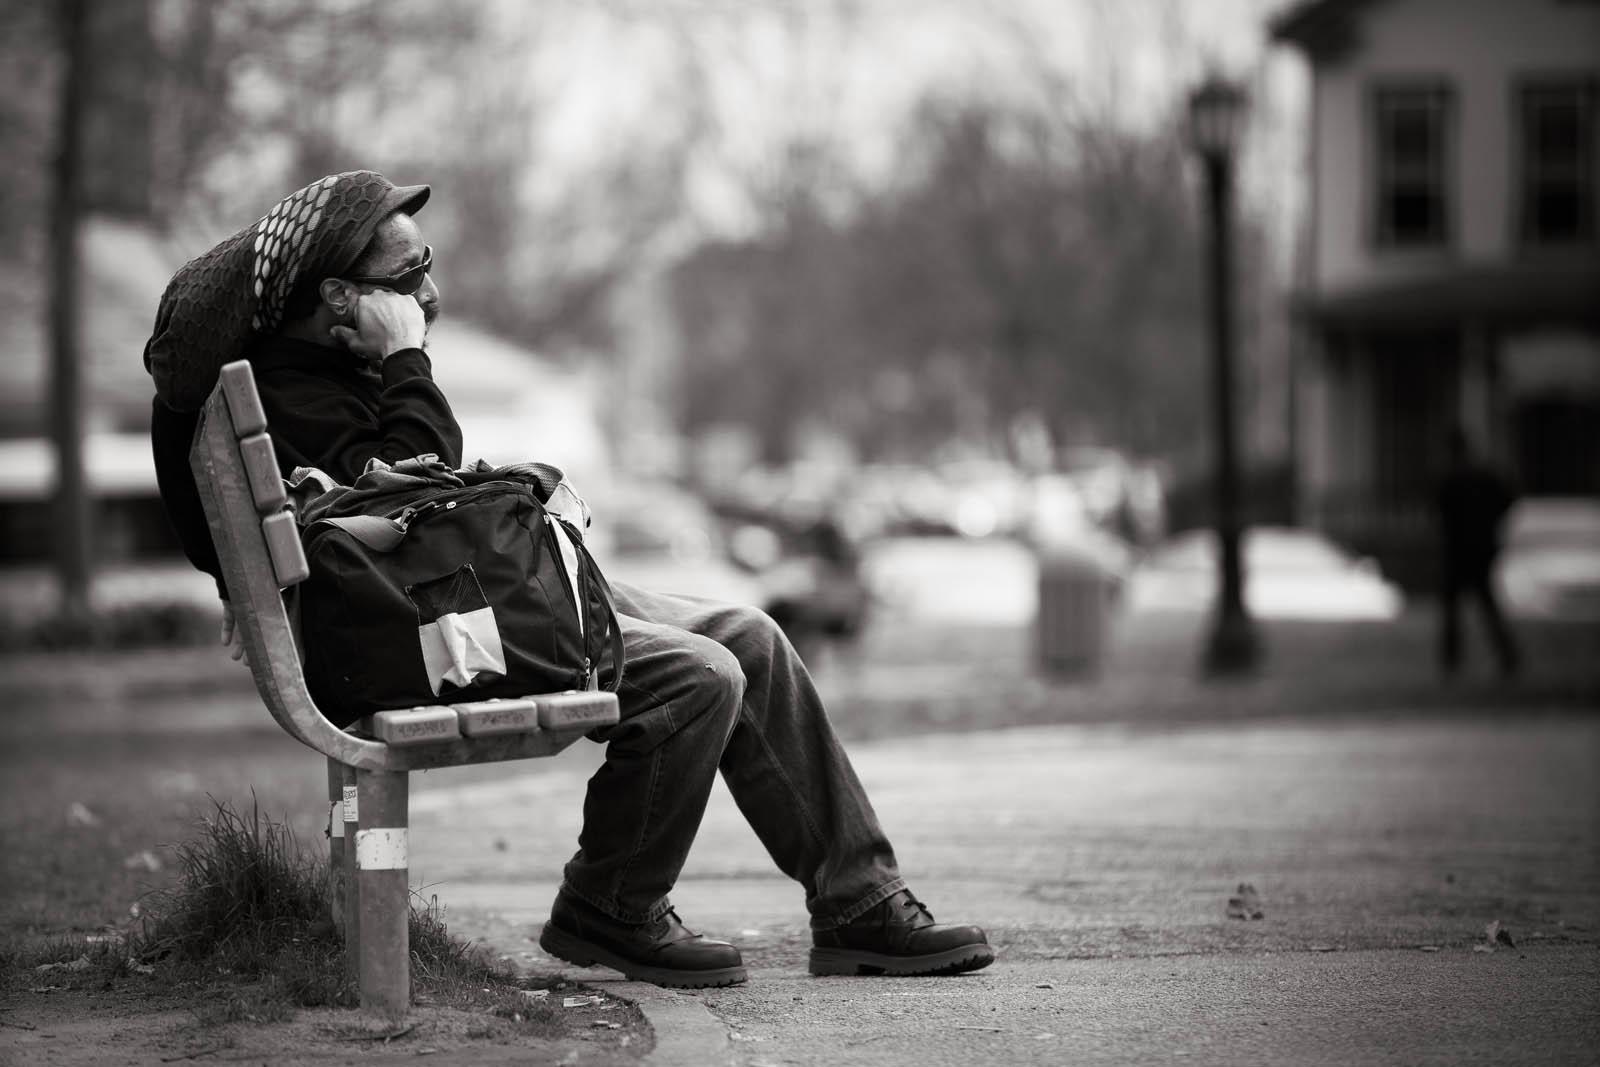 StreetPhotography_DownTownRaleighNC_ErnestoSue-2370.jpg